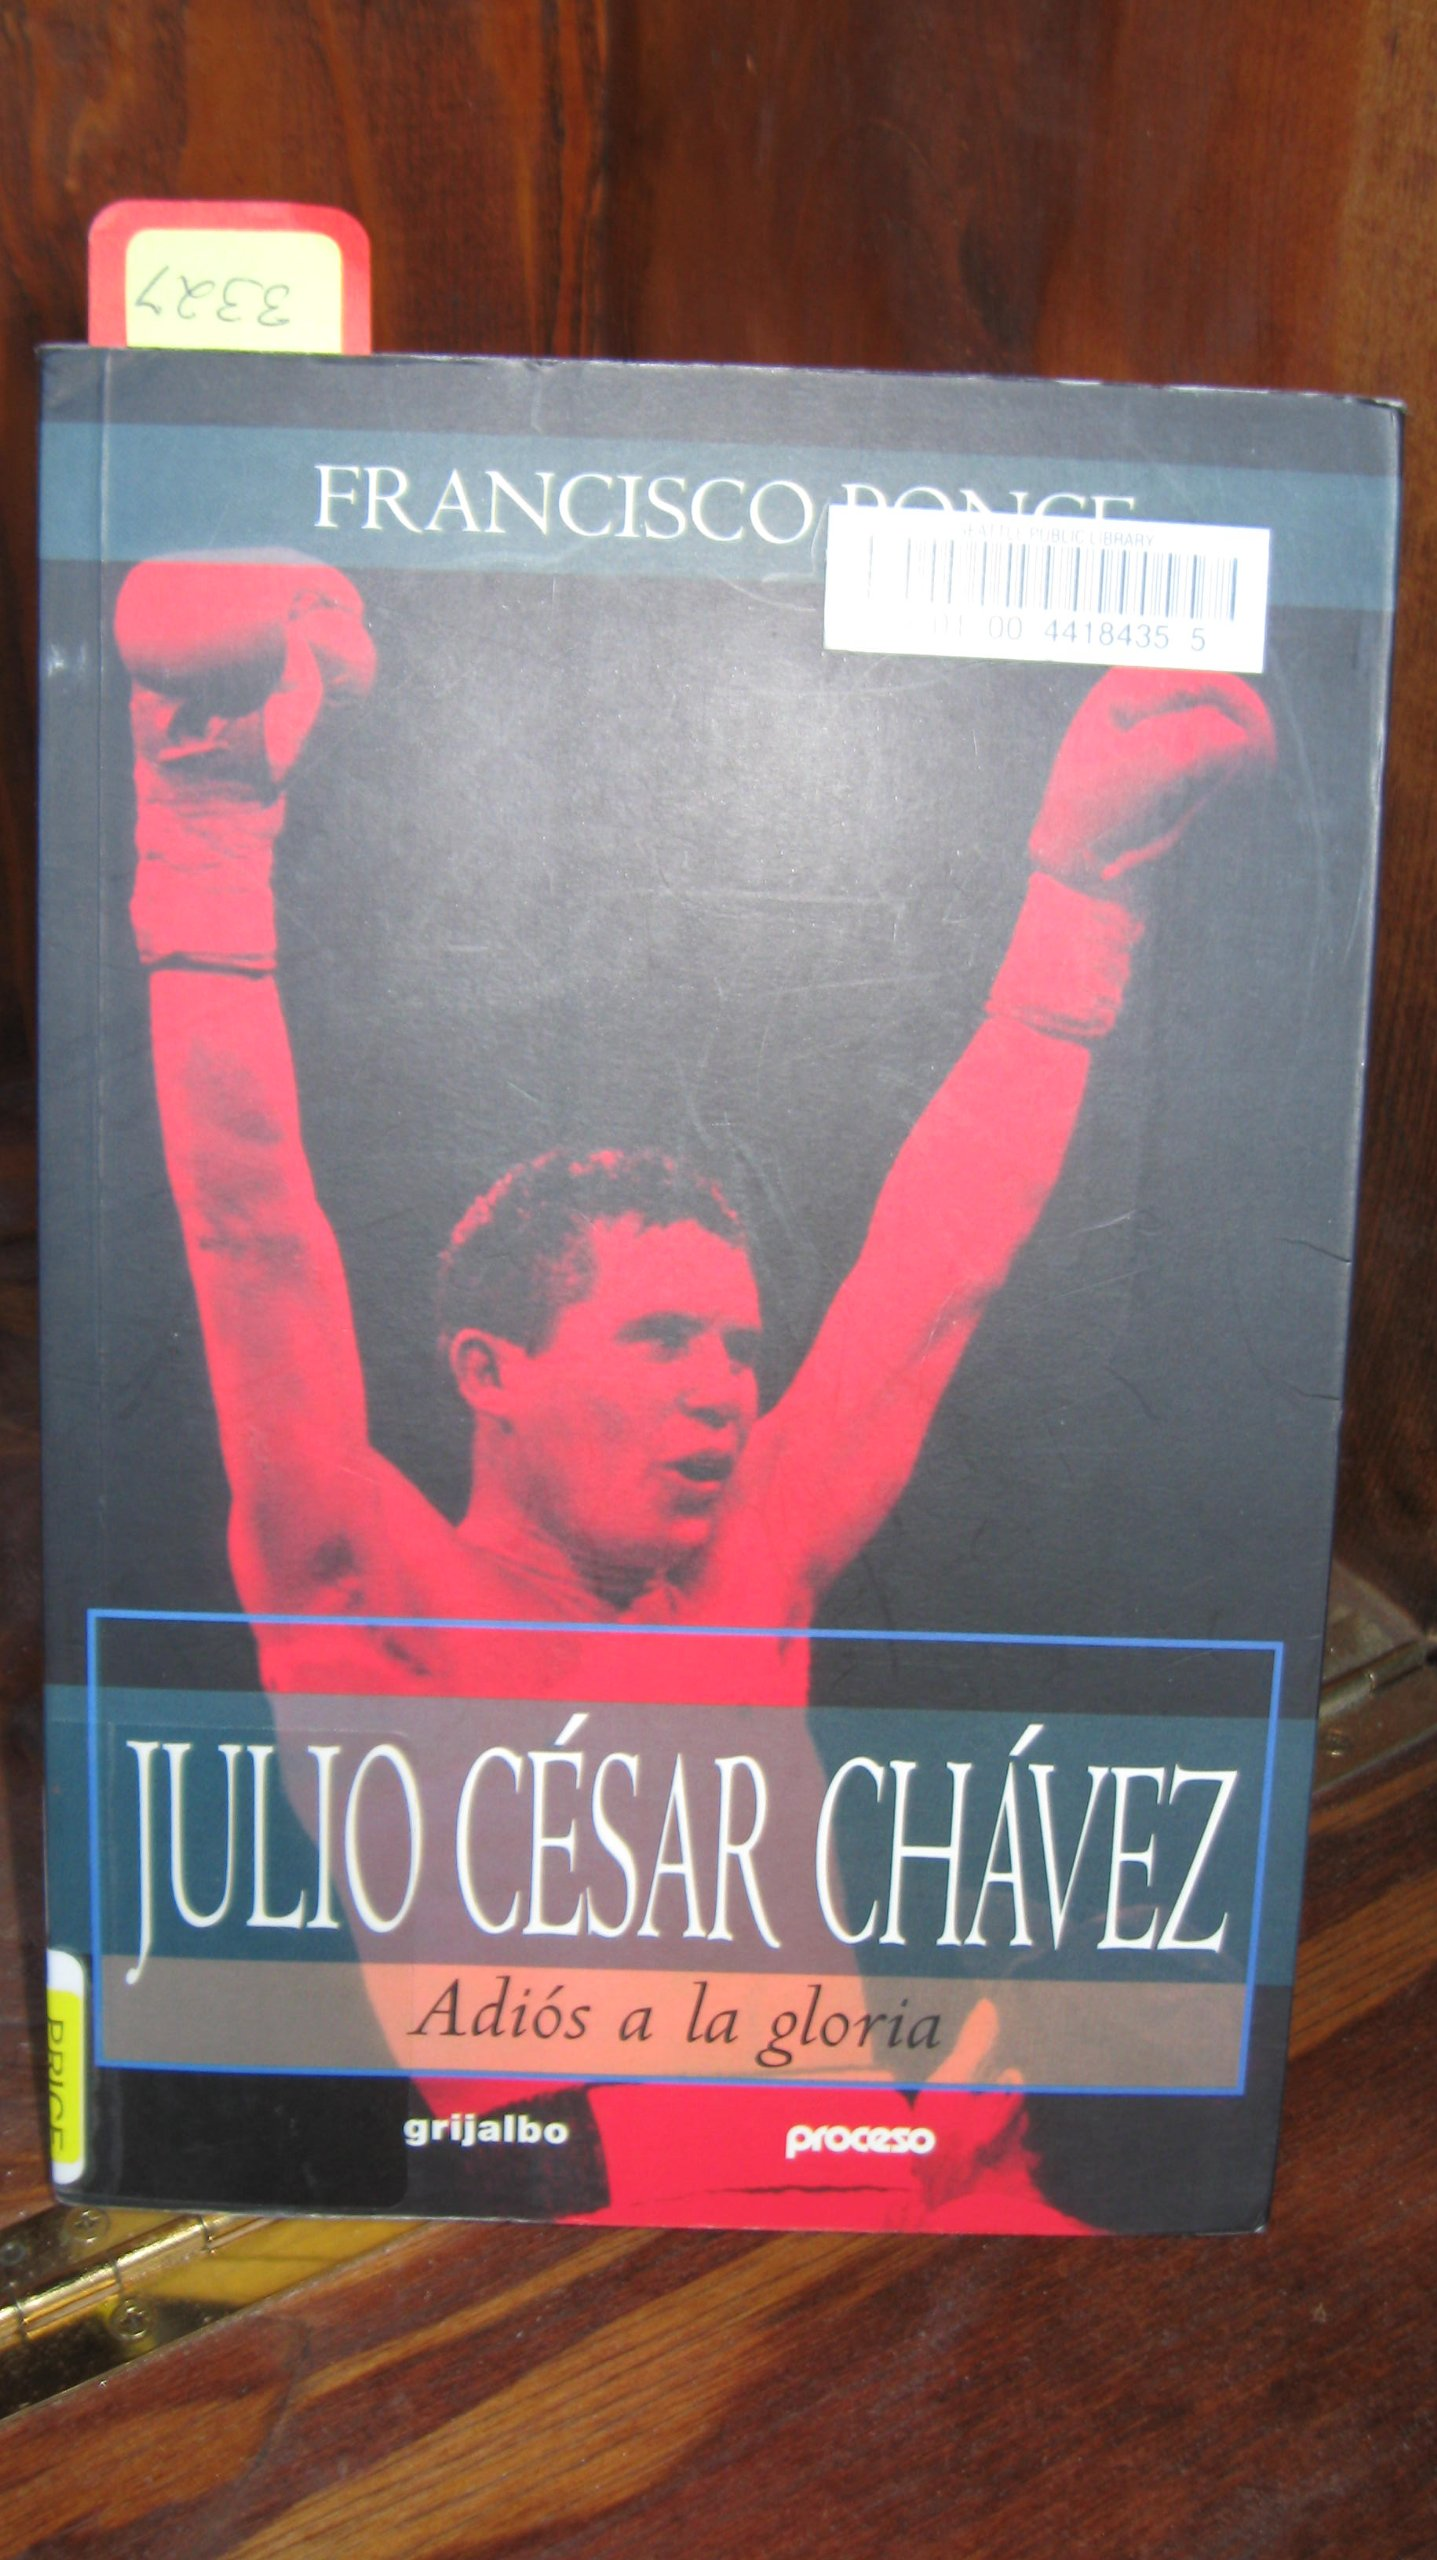 Julio Cesar Chavez: Adios a la Gloria (Spanish) Paperback – April 1, 2001